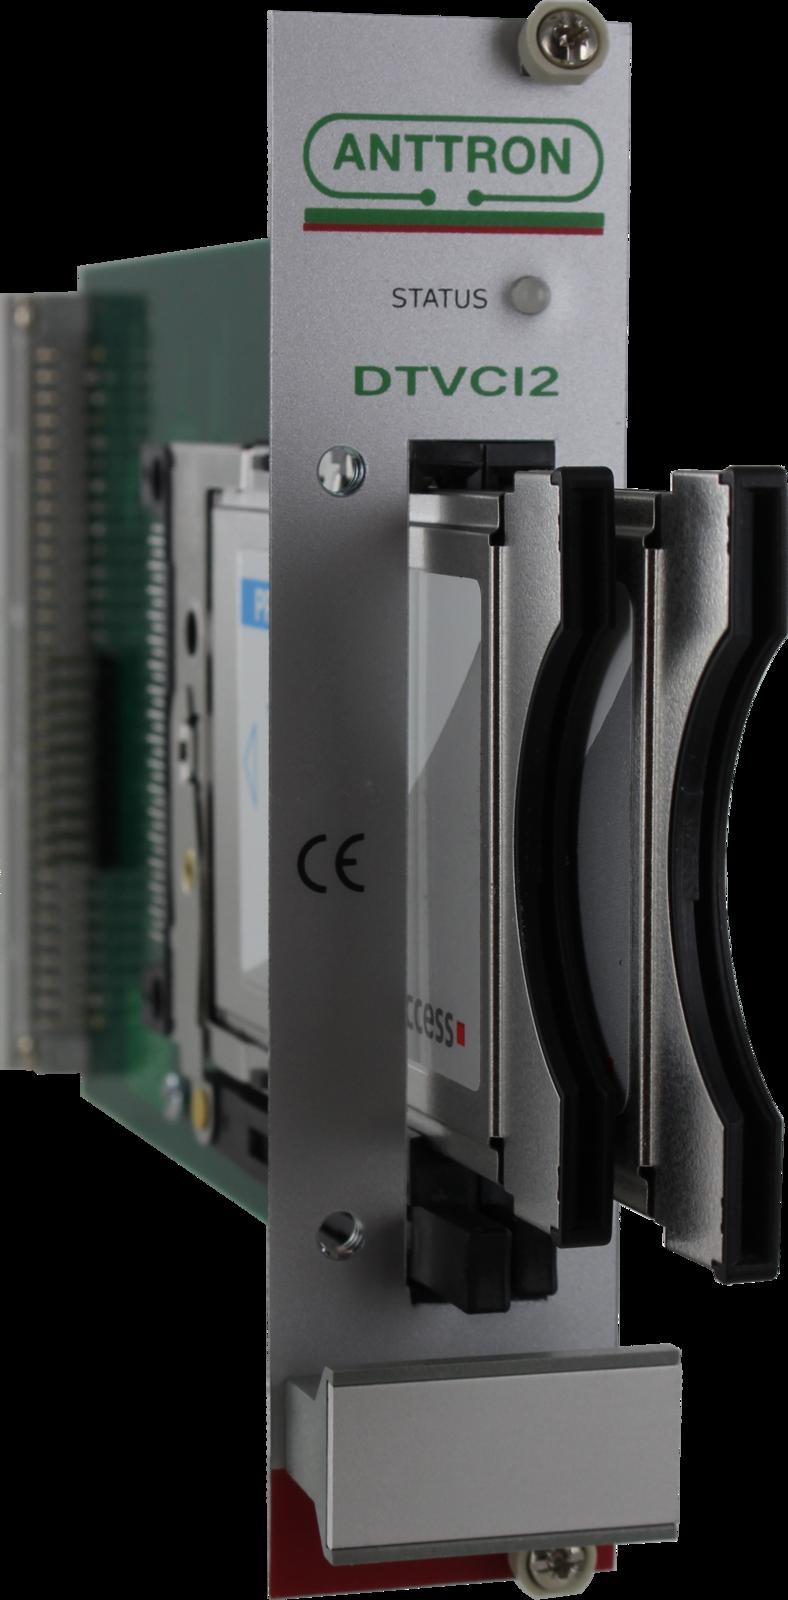 Anttron Dual CI module